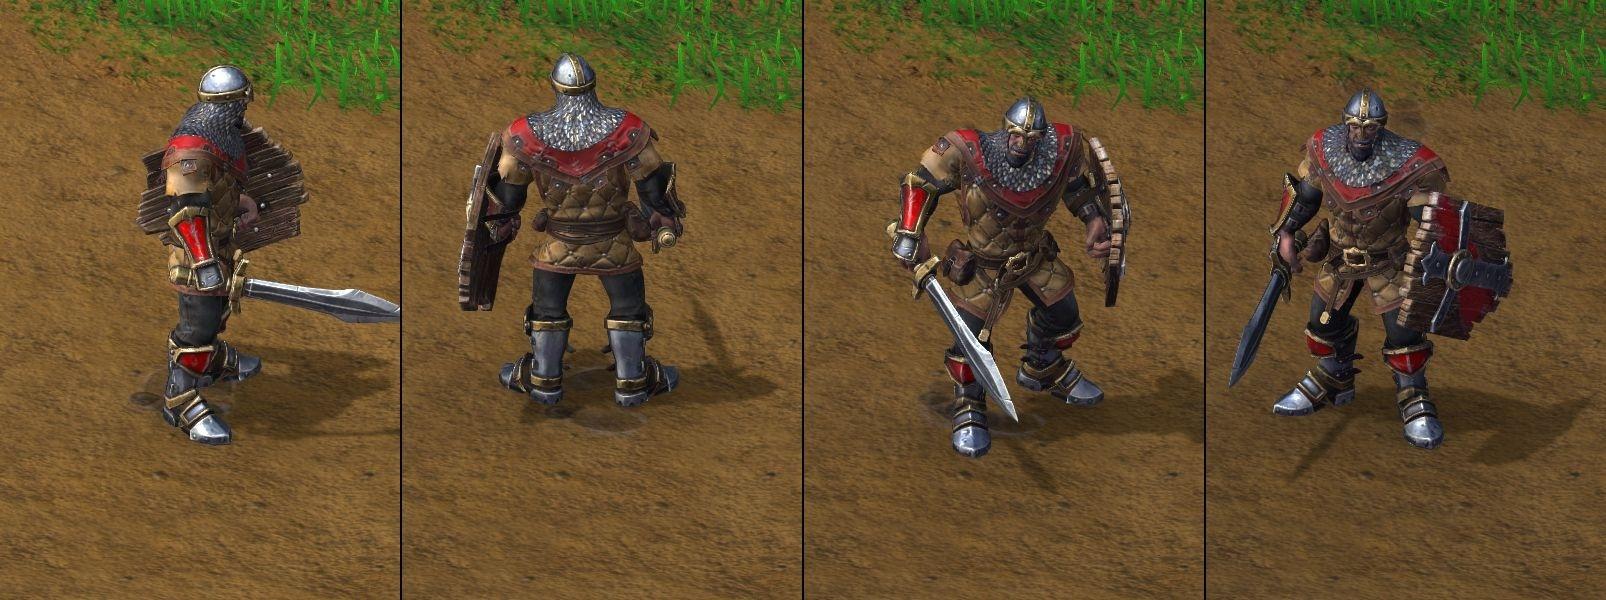 Warcraft 3 Reforged Militia